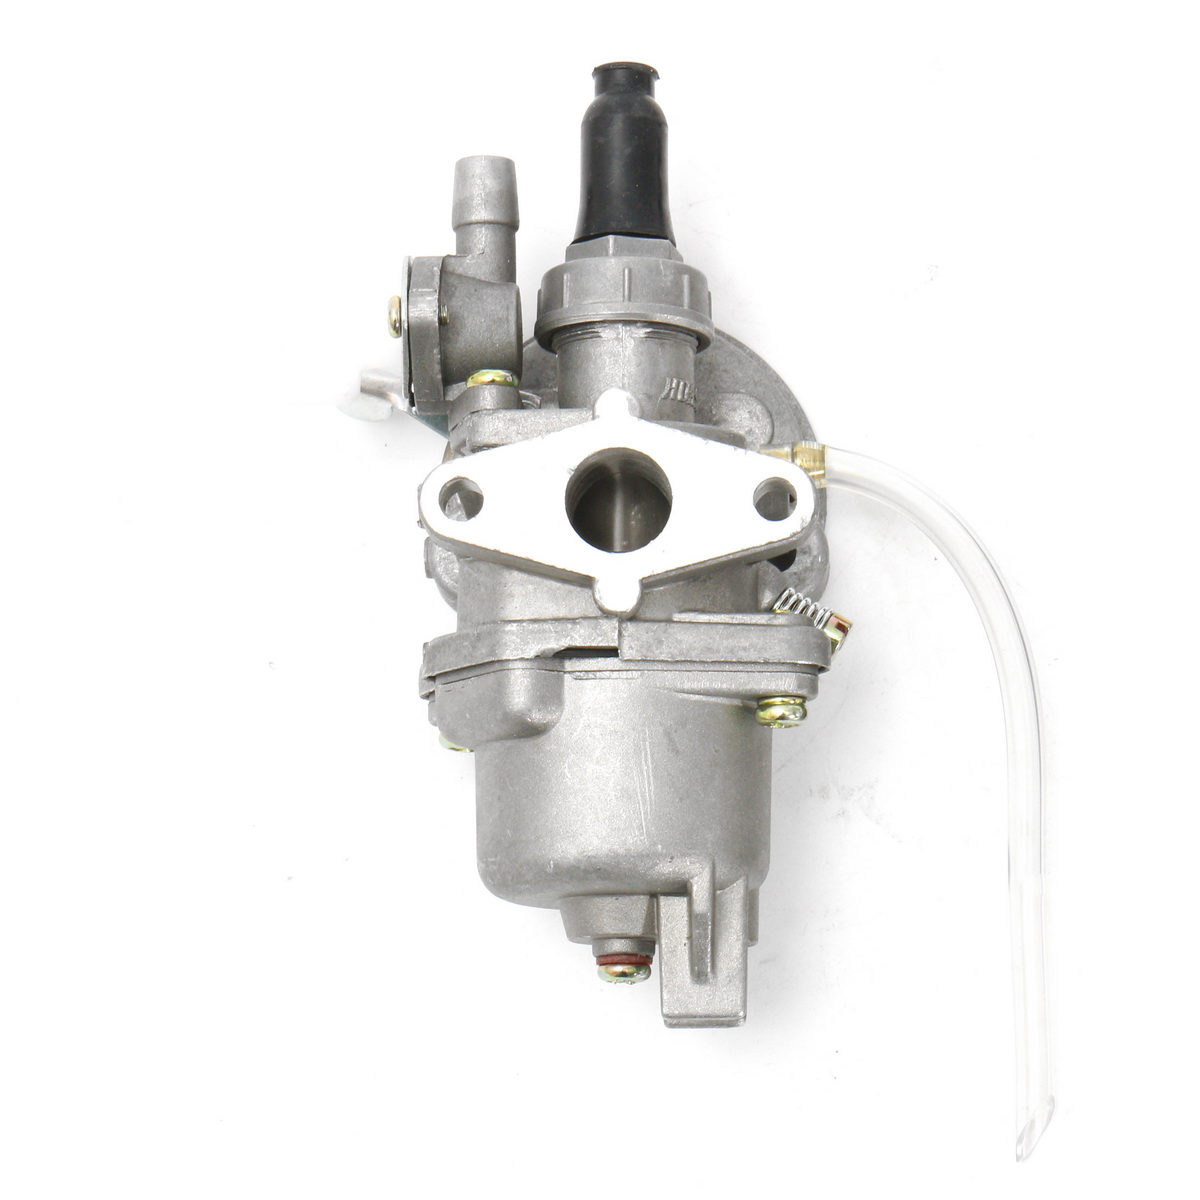 Air Filter Assembly : Carburetor air filter assembly kit for cc mini moto